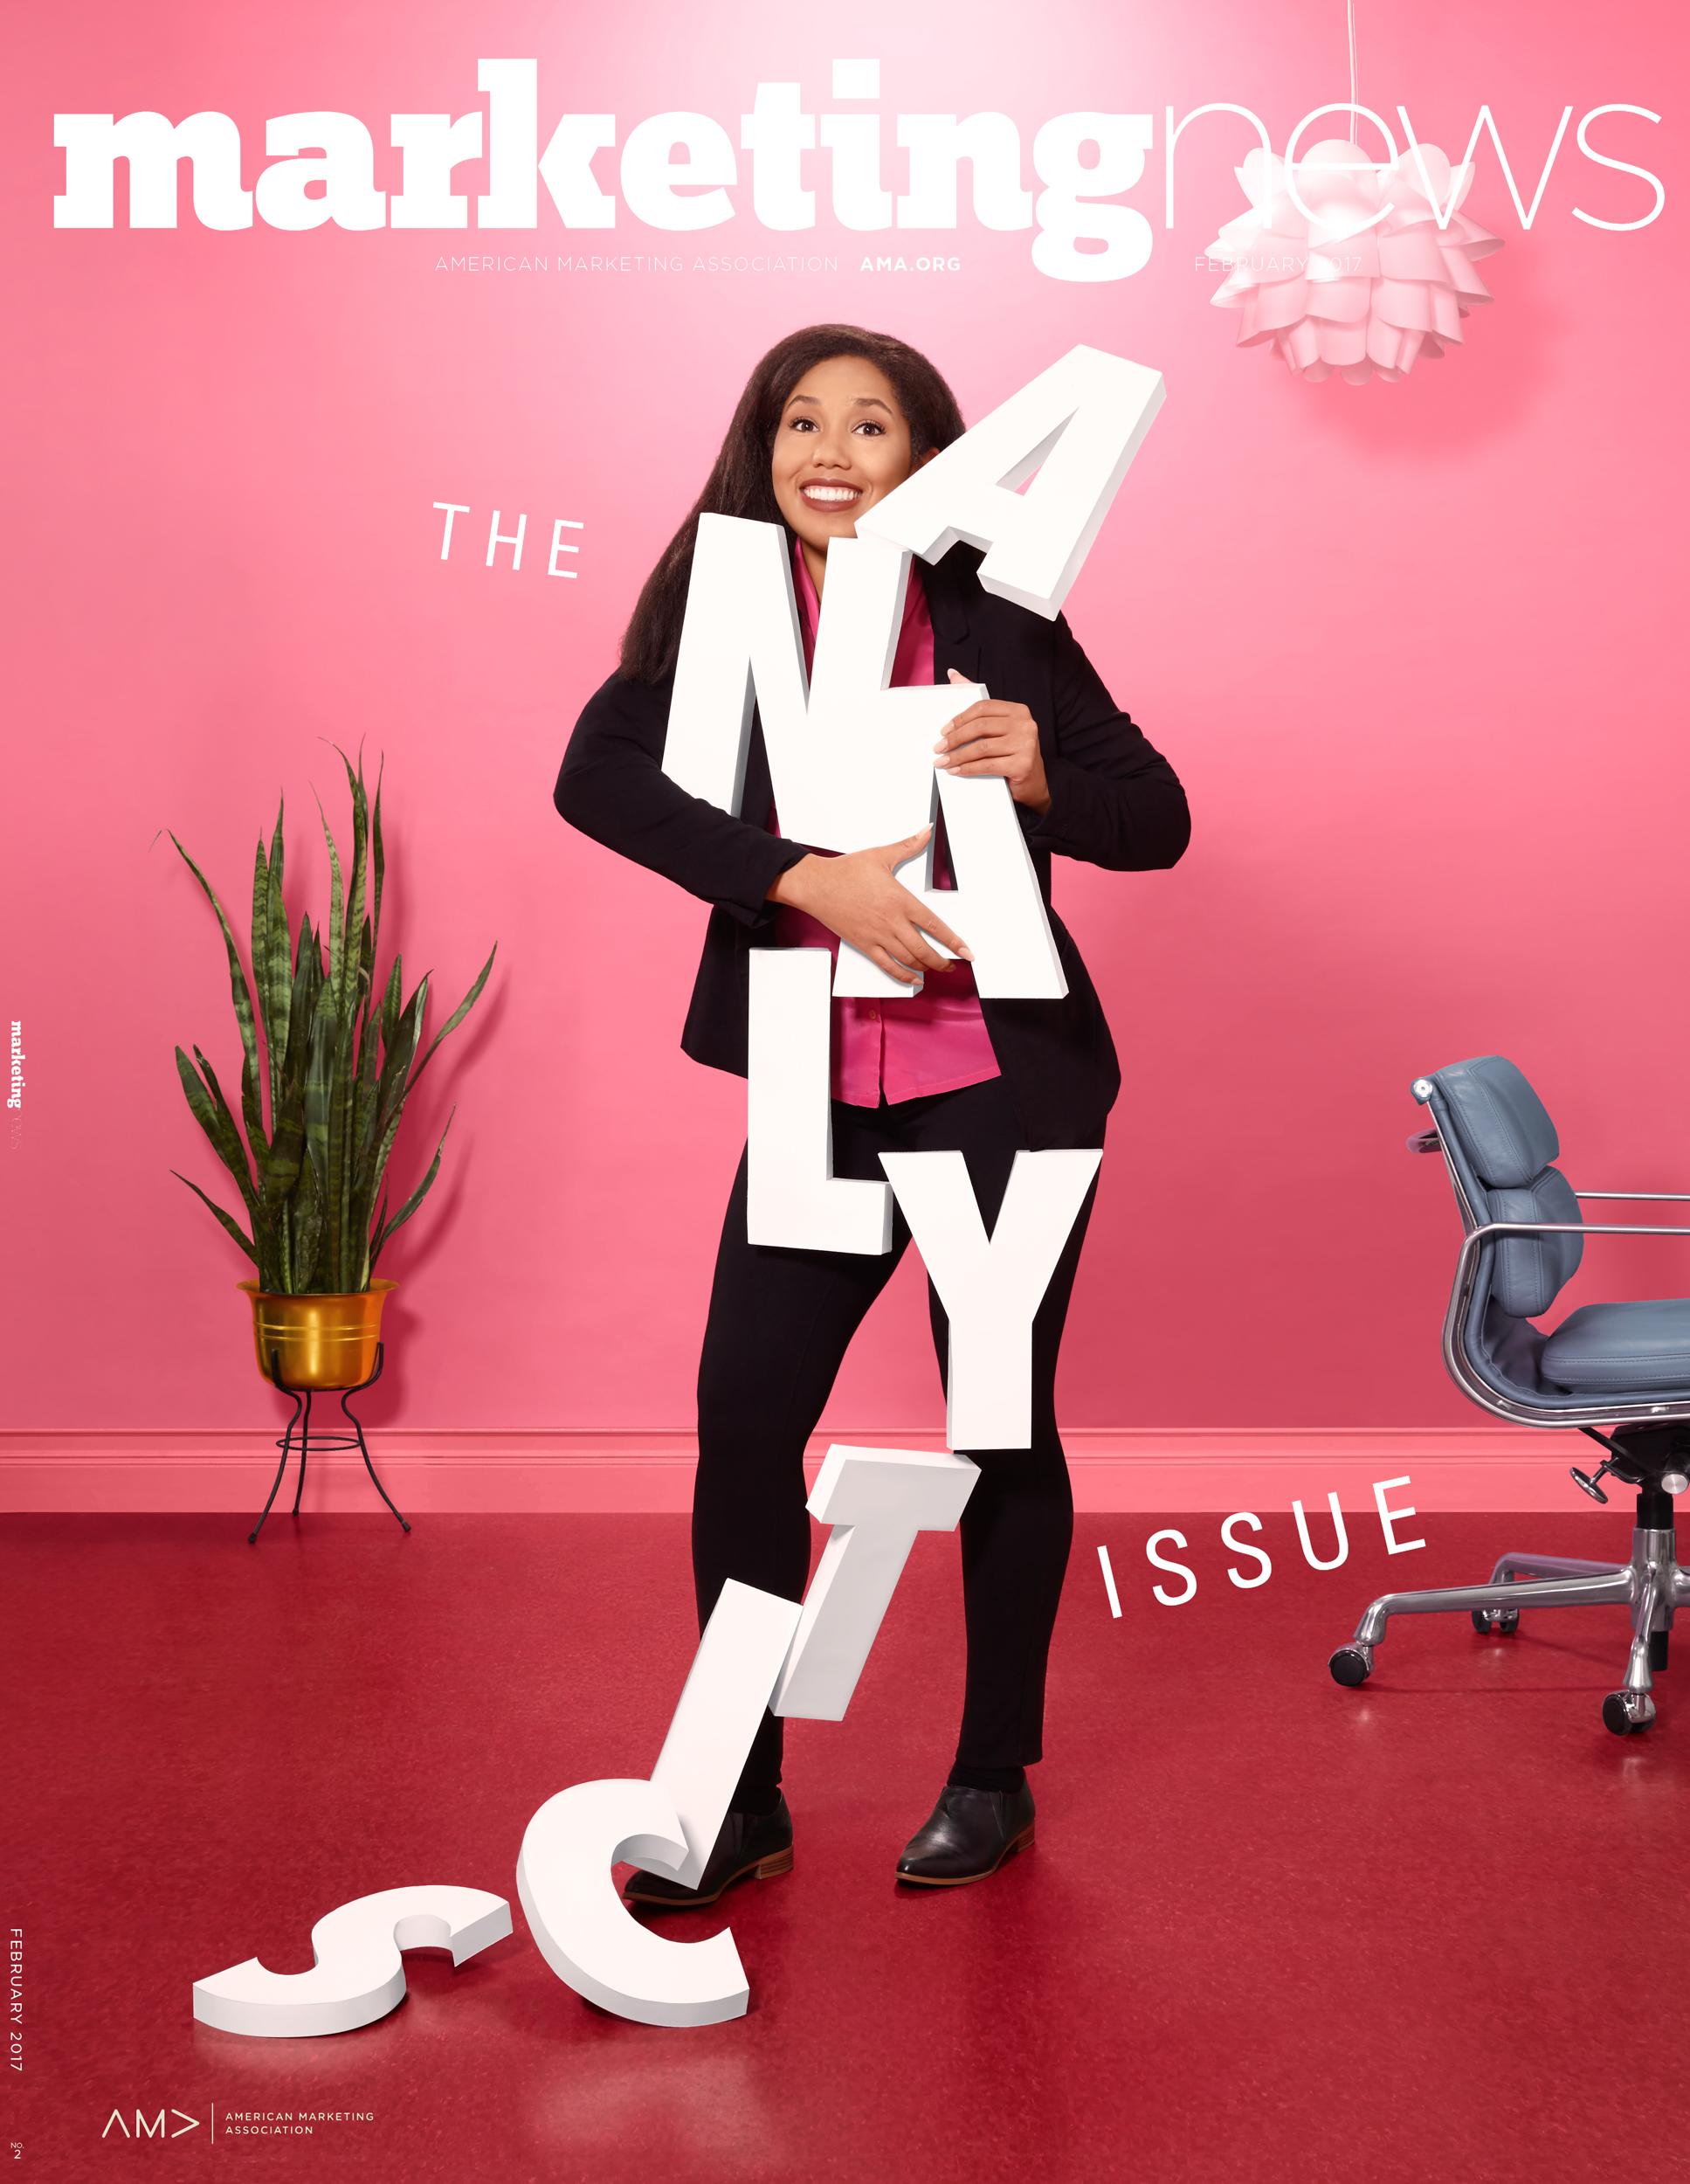 Marketing News Magazine - Lisa Predko